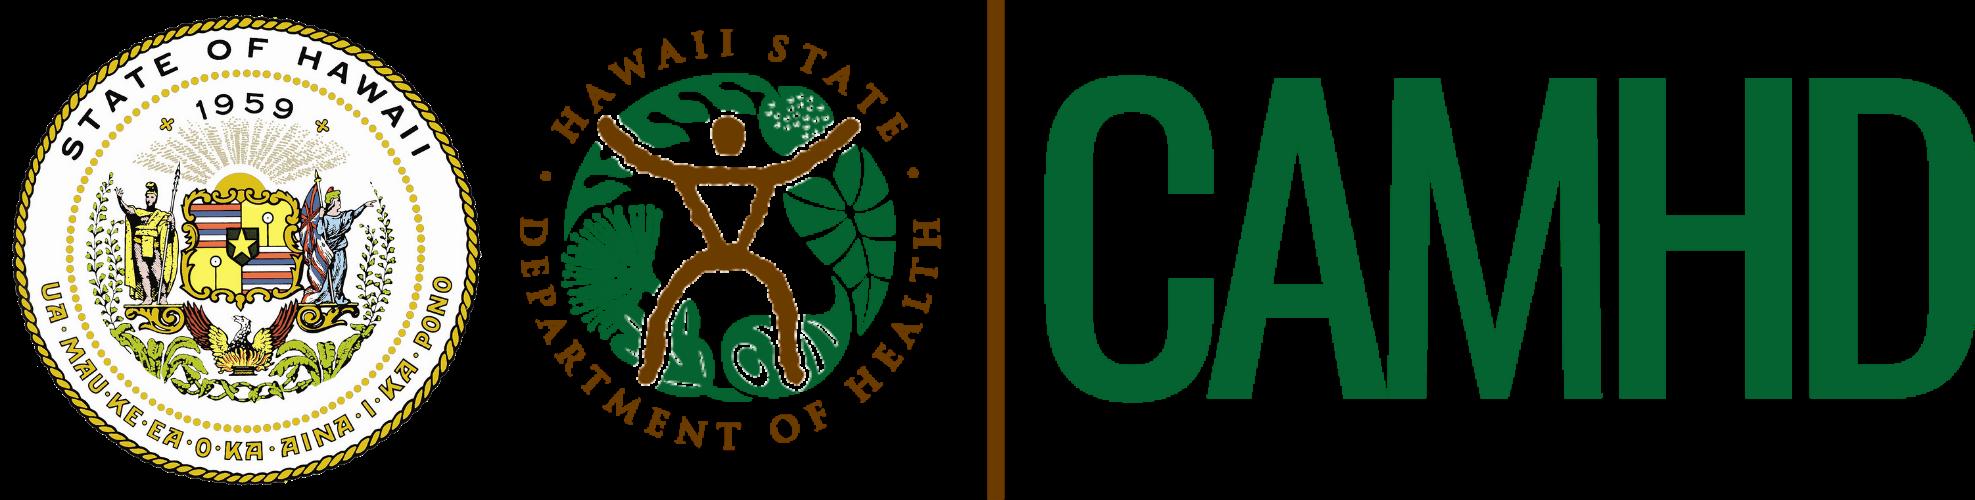 Child & Adolescent Mental Health Division logo